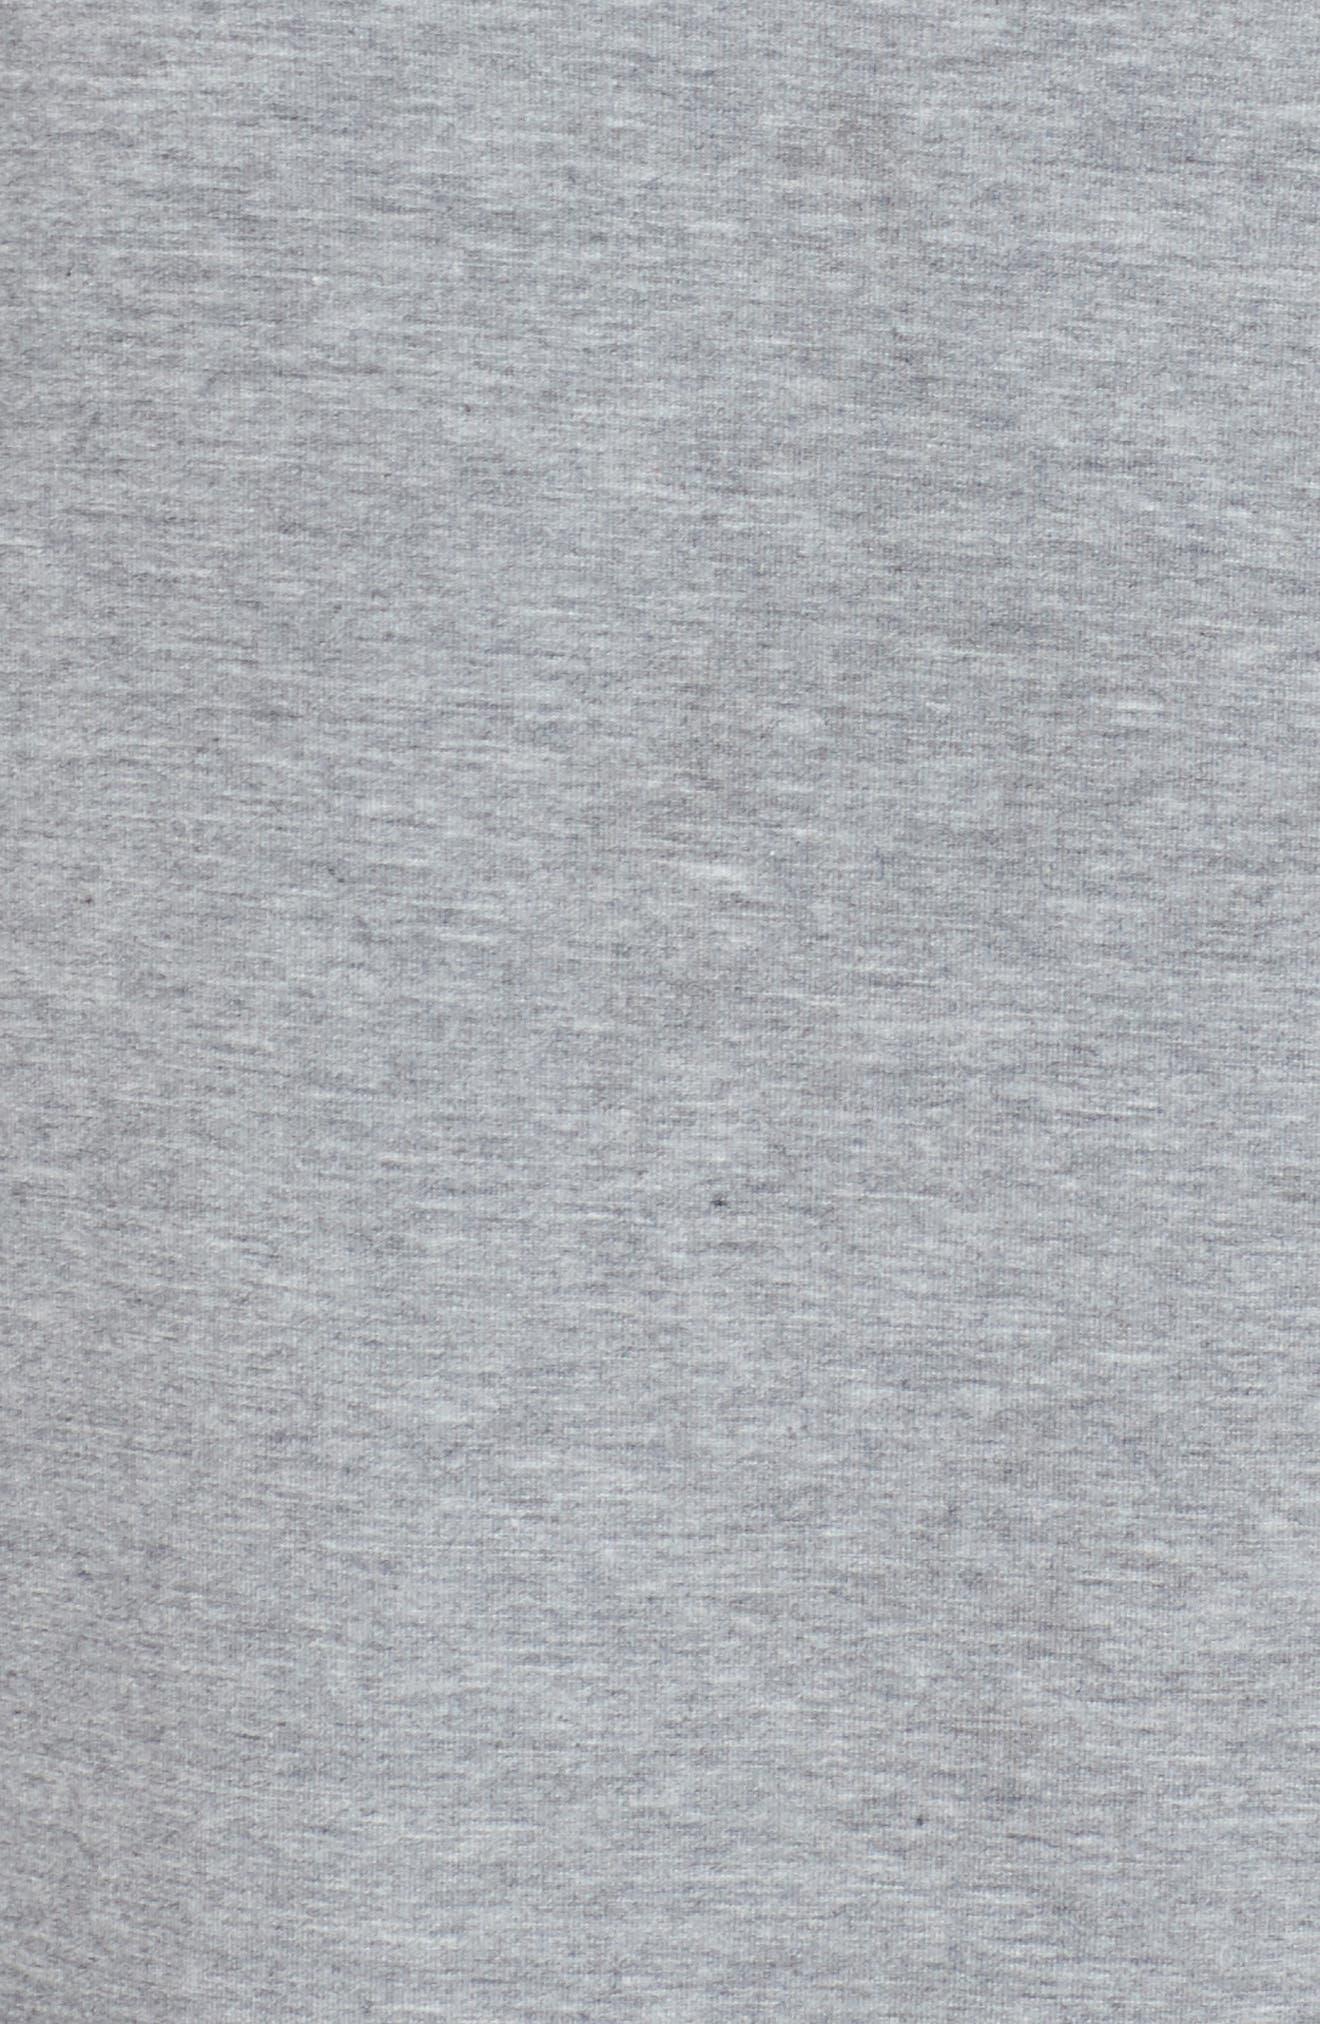 Breathe Sleep Shirt,                             Alternate thumbnail 5, color,                             GREY STEEL HEATHER